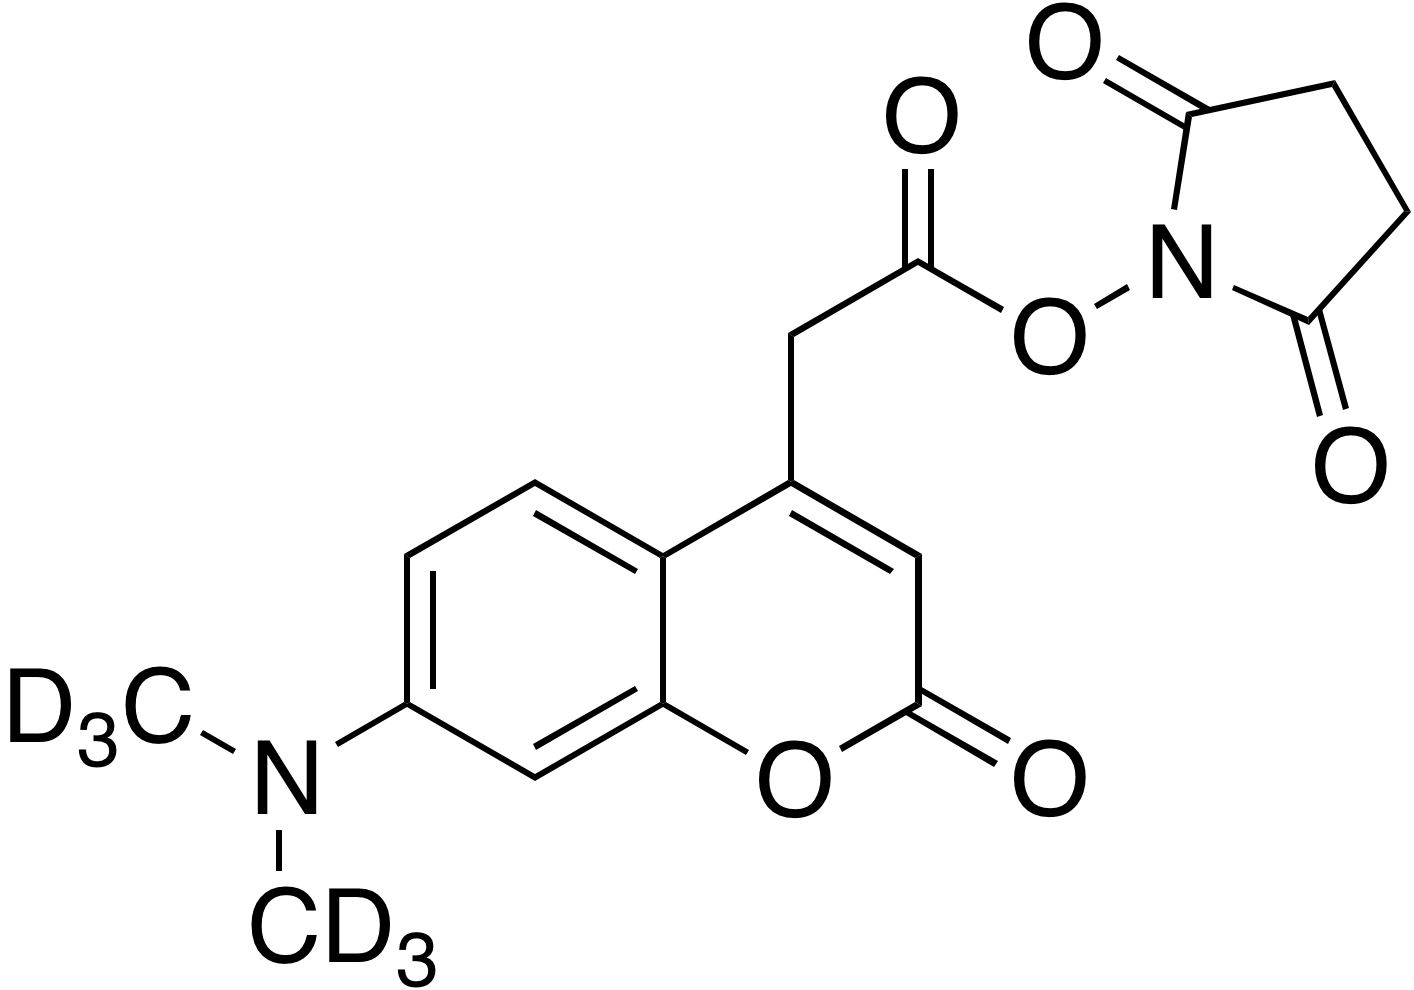 7-Dimethylamino-d<sub>6</sub>-coumarin-4-acetic acid, succinimidyl ester